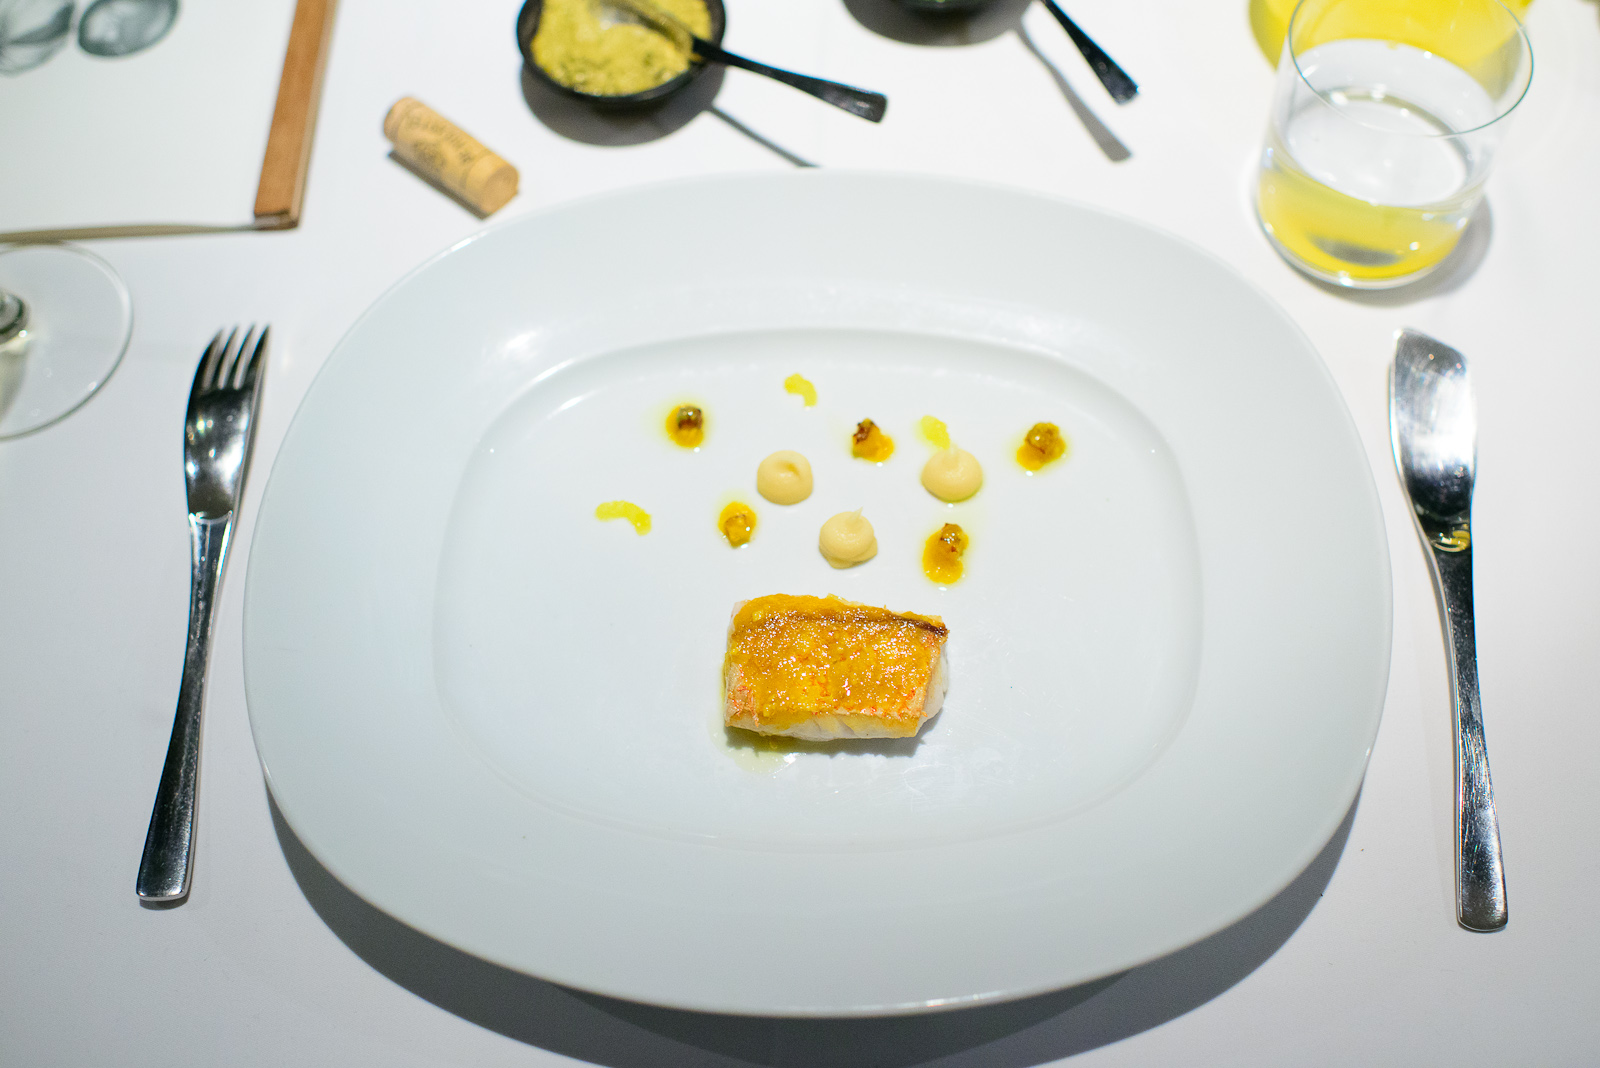 6th Course: Huachinango frito, mojo de jengibre y chile habanero